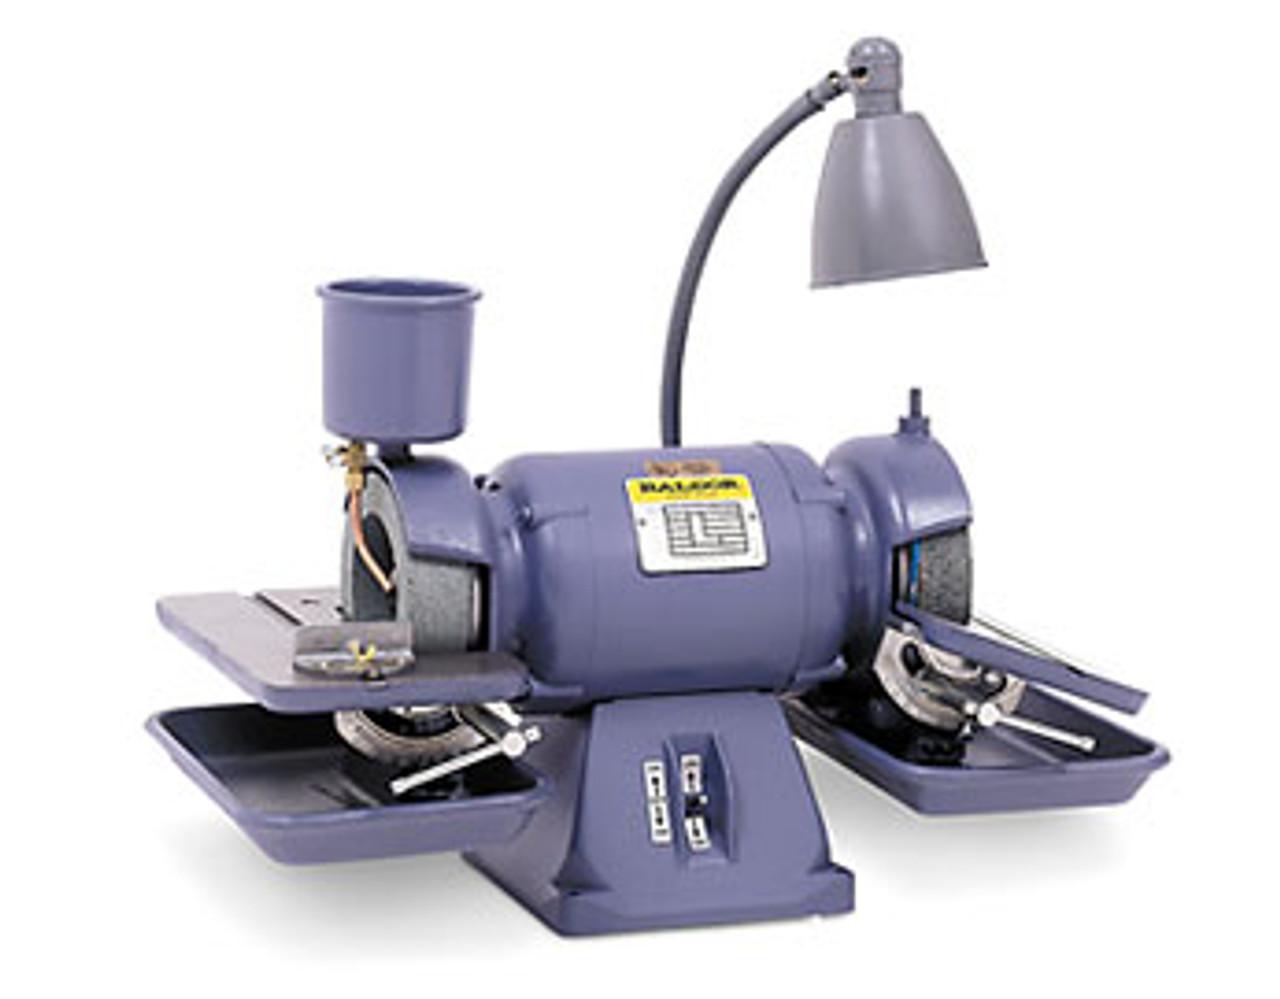 Terrific Baldor 500 6 Tool Grinder 115 Volt 1 2 Hp Pdpeps Interior Chair Design Pdpepsorg